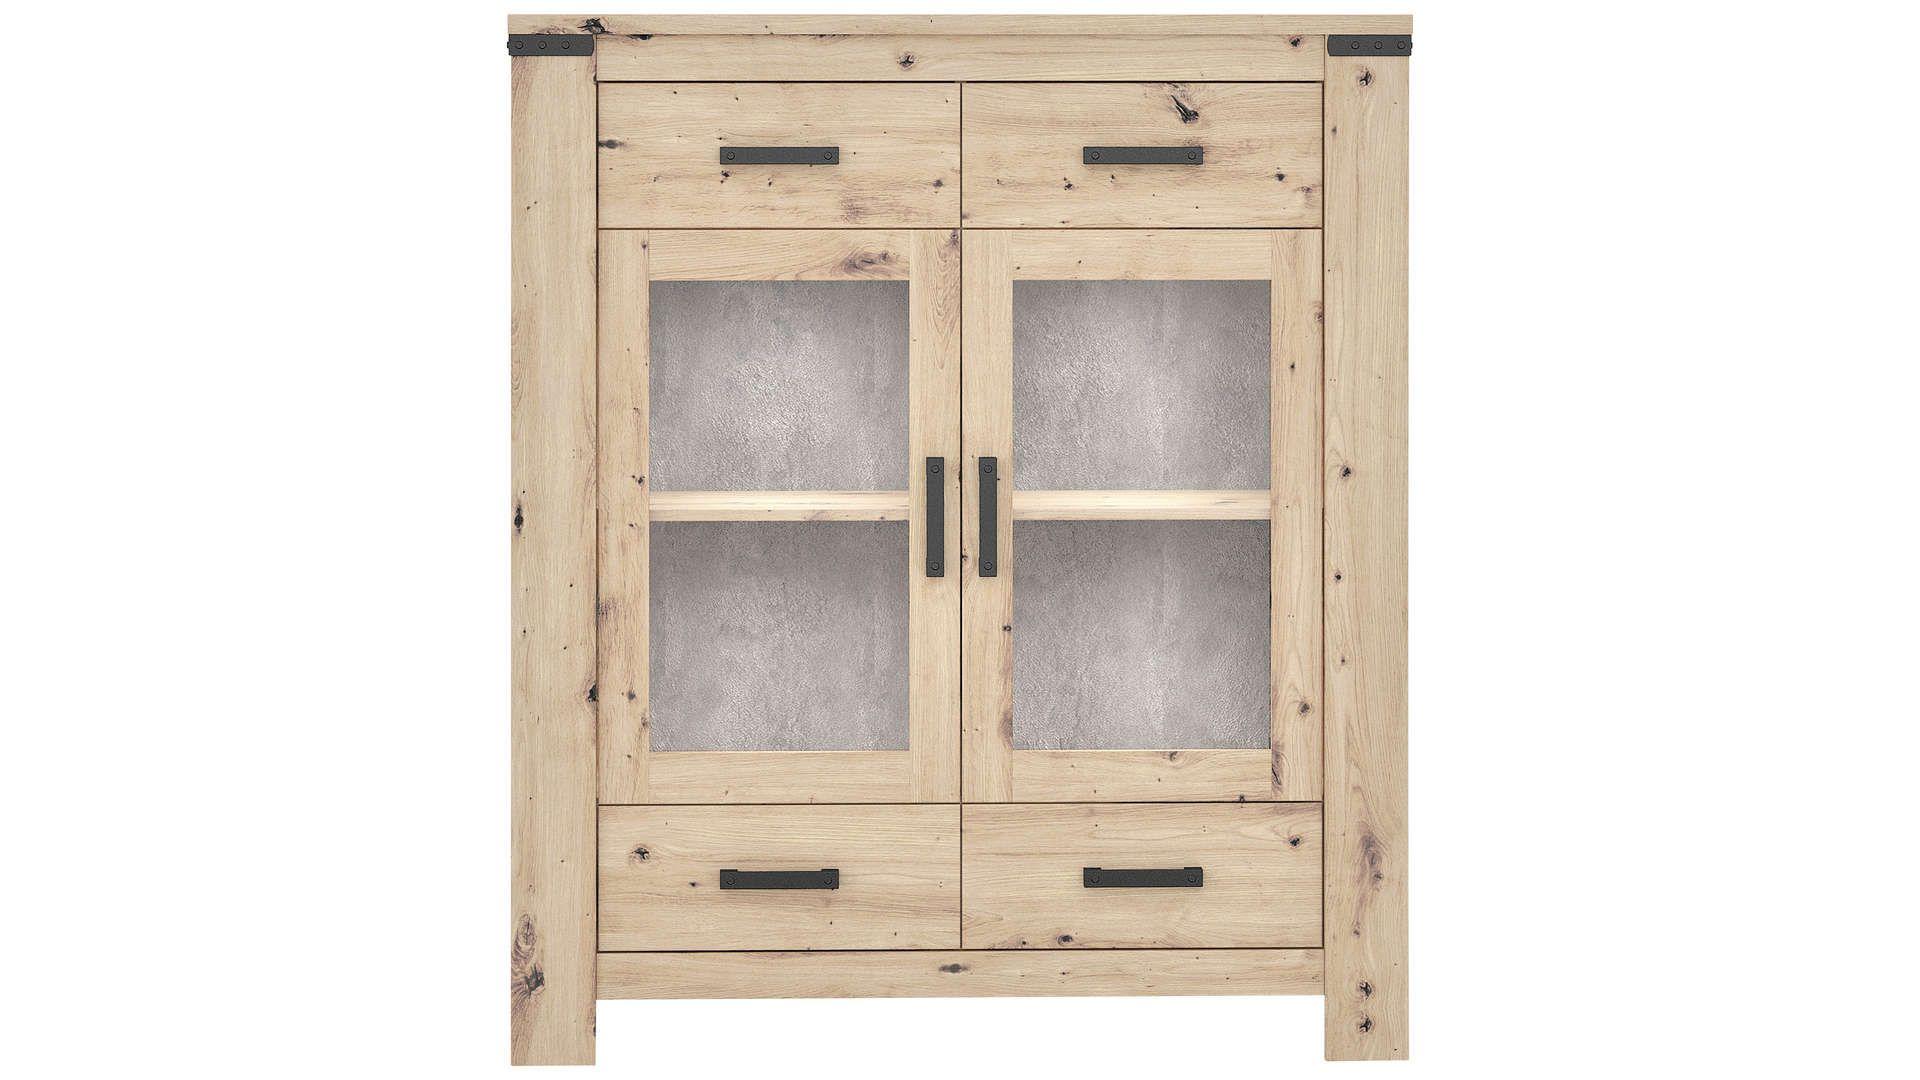 Argentier 15 portes+15 tiroirs HAWAI Imitation chêne naturel